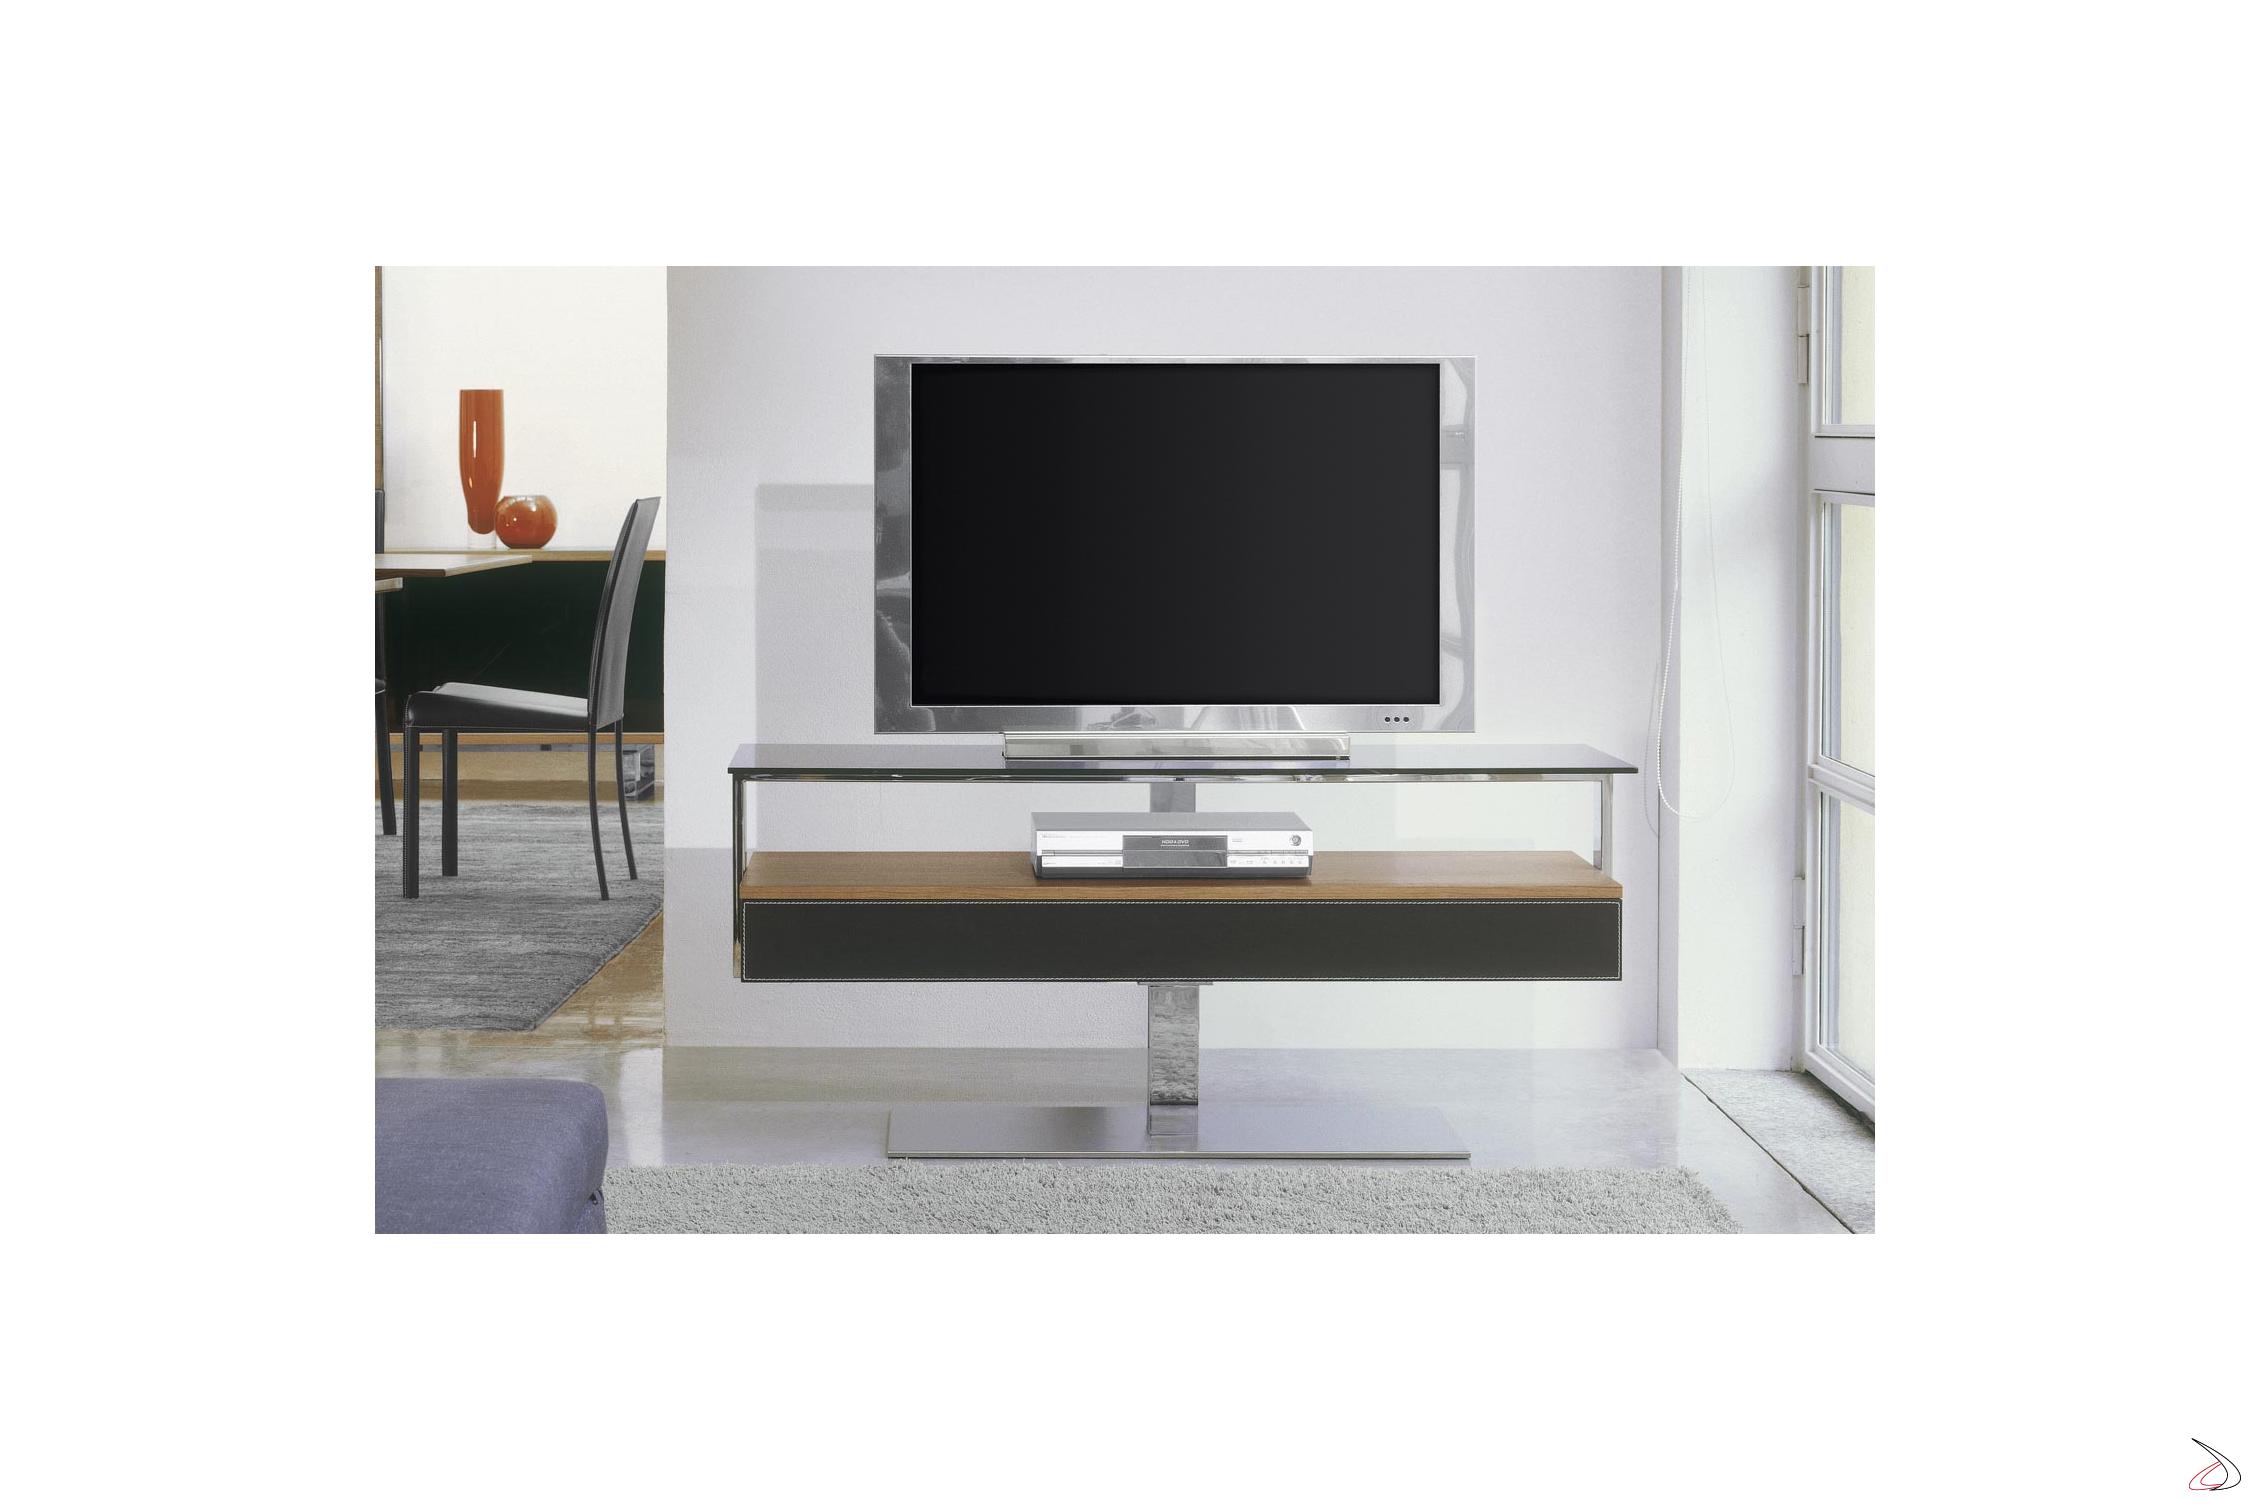 Carrelli Porta Tv Led.Elica Design Tv Stand Toparredi Arredo Design Online